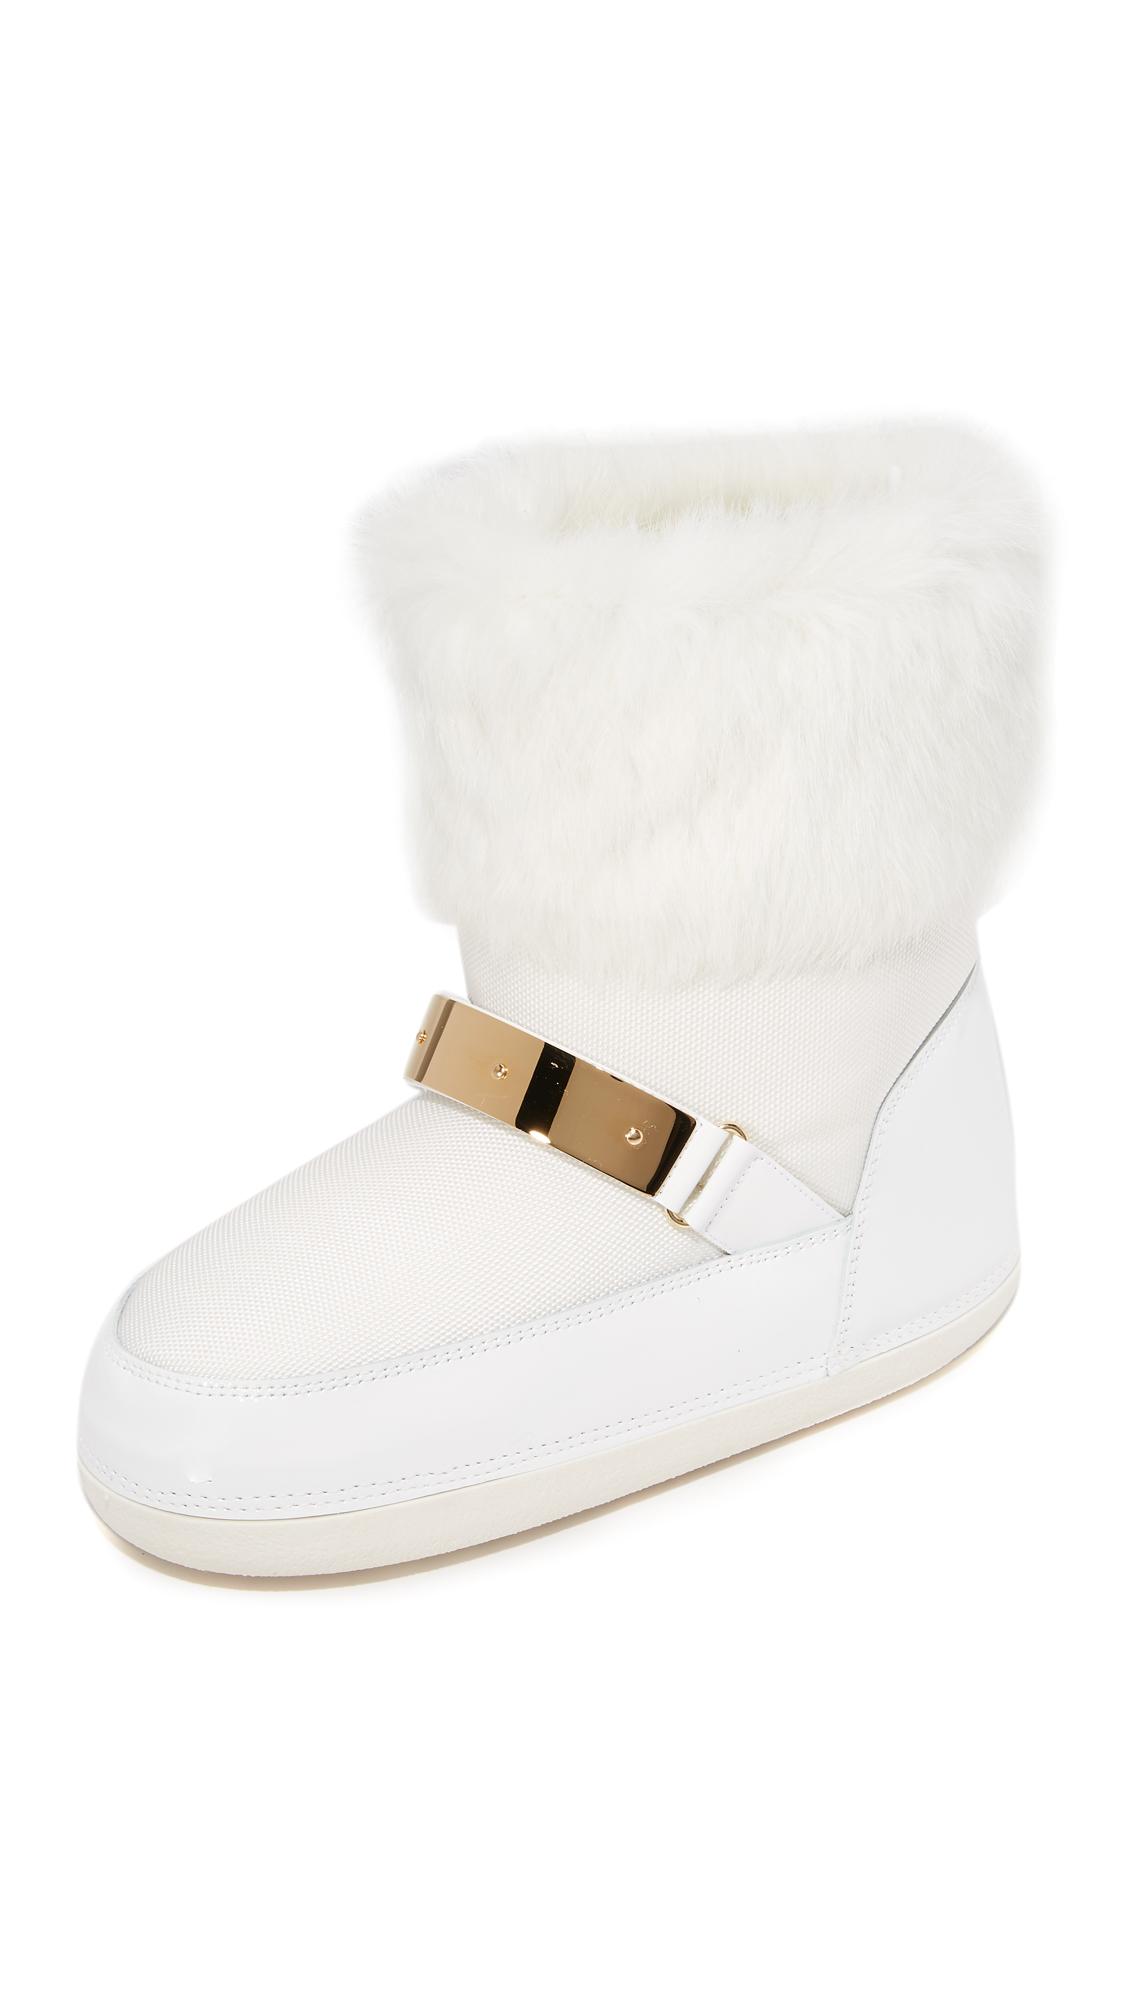 Giuseppe Zanotti Moon Boots - White at Shopbop